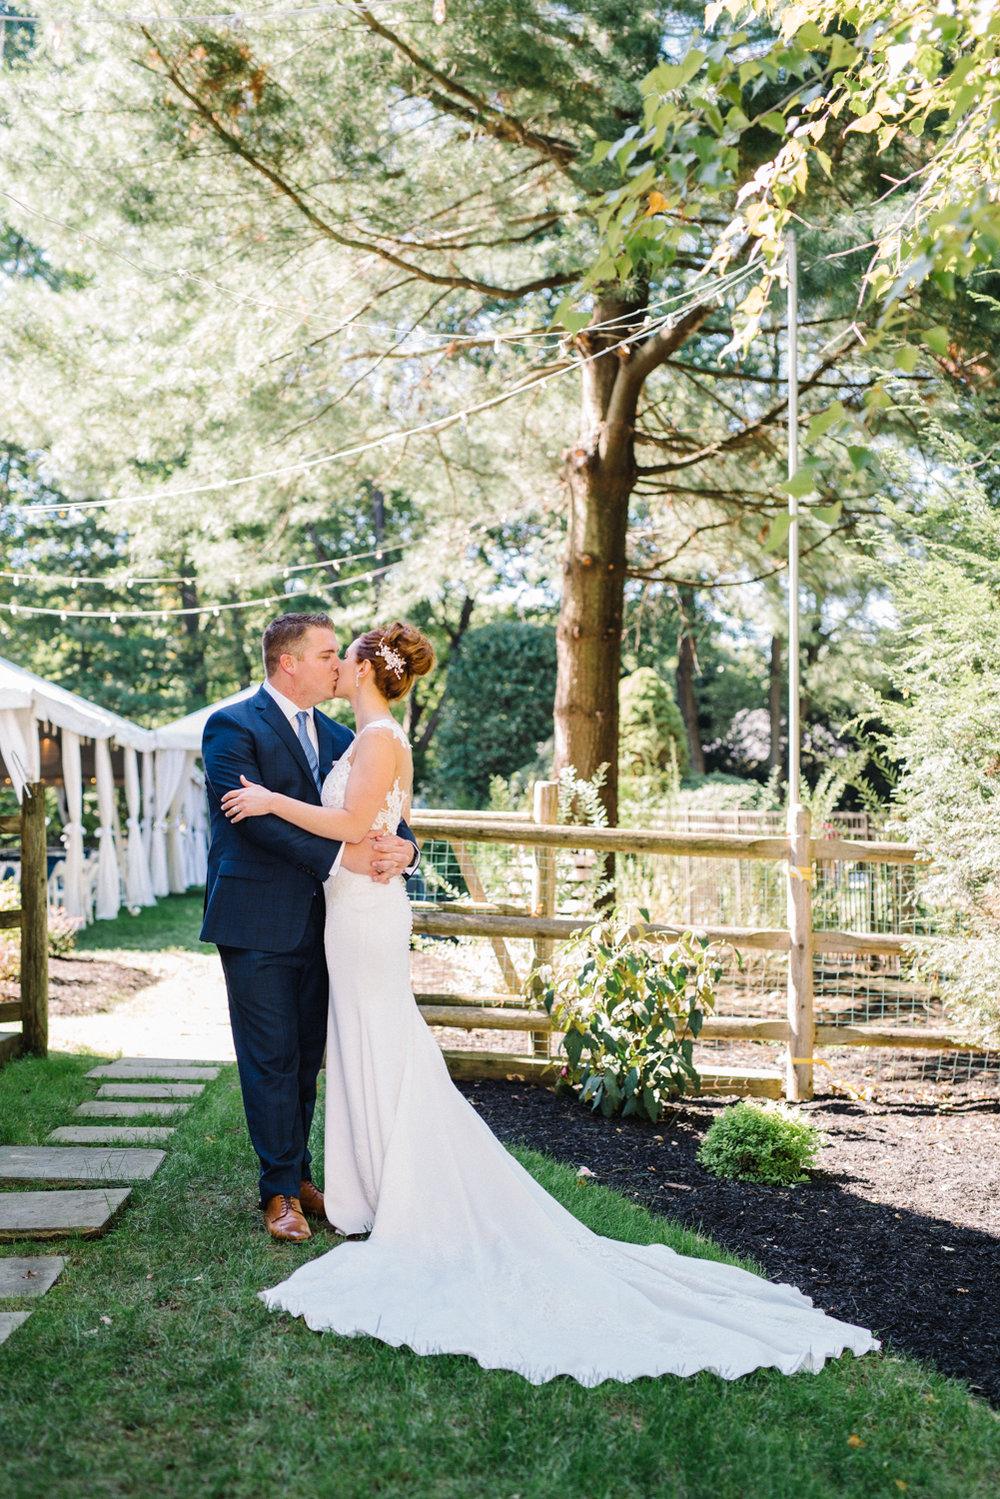 Lauren+AJ- DIY Backyard Wedding- New Jersey- Olivia Christina Photo-62.JPG